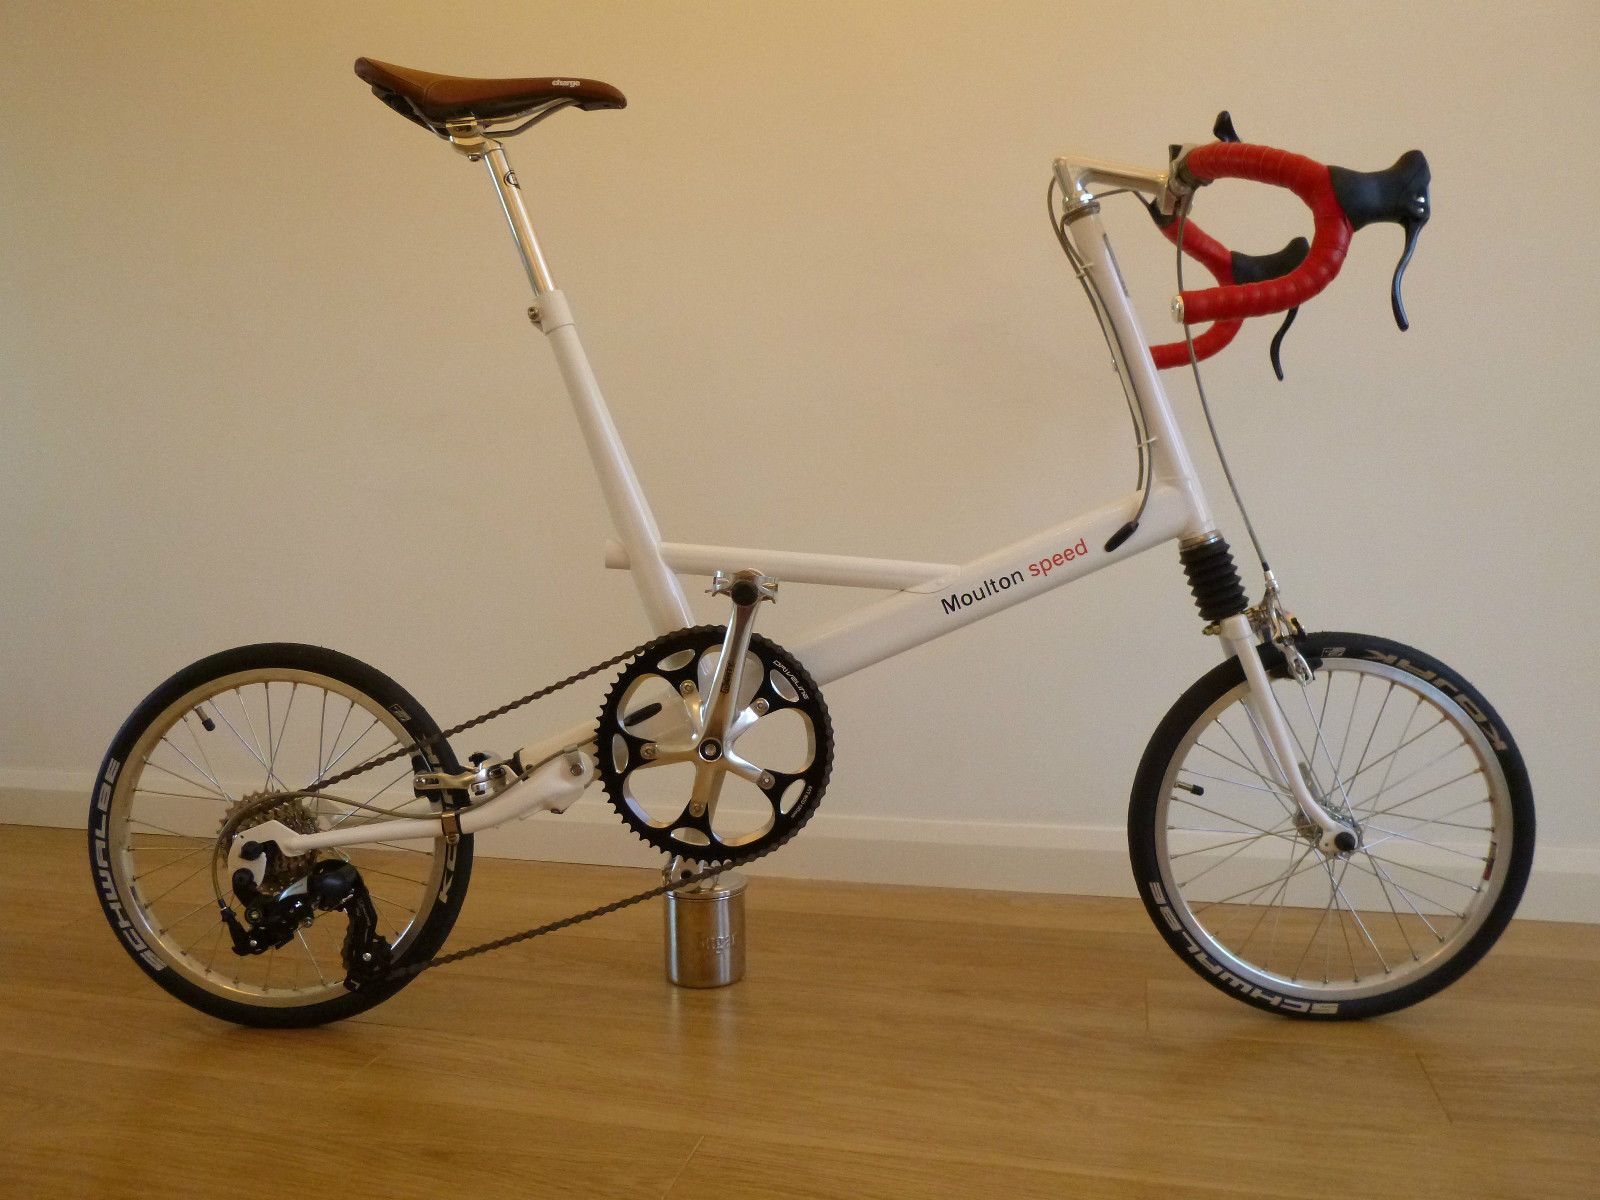 Moulton vintage road racing bicycle | eBay UK | Moulton ...